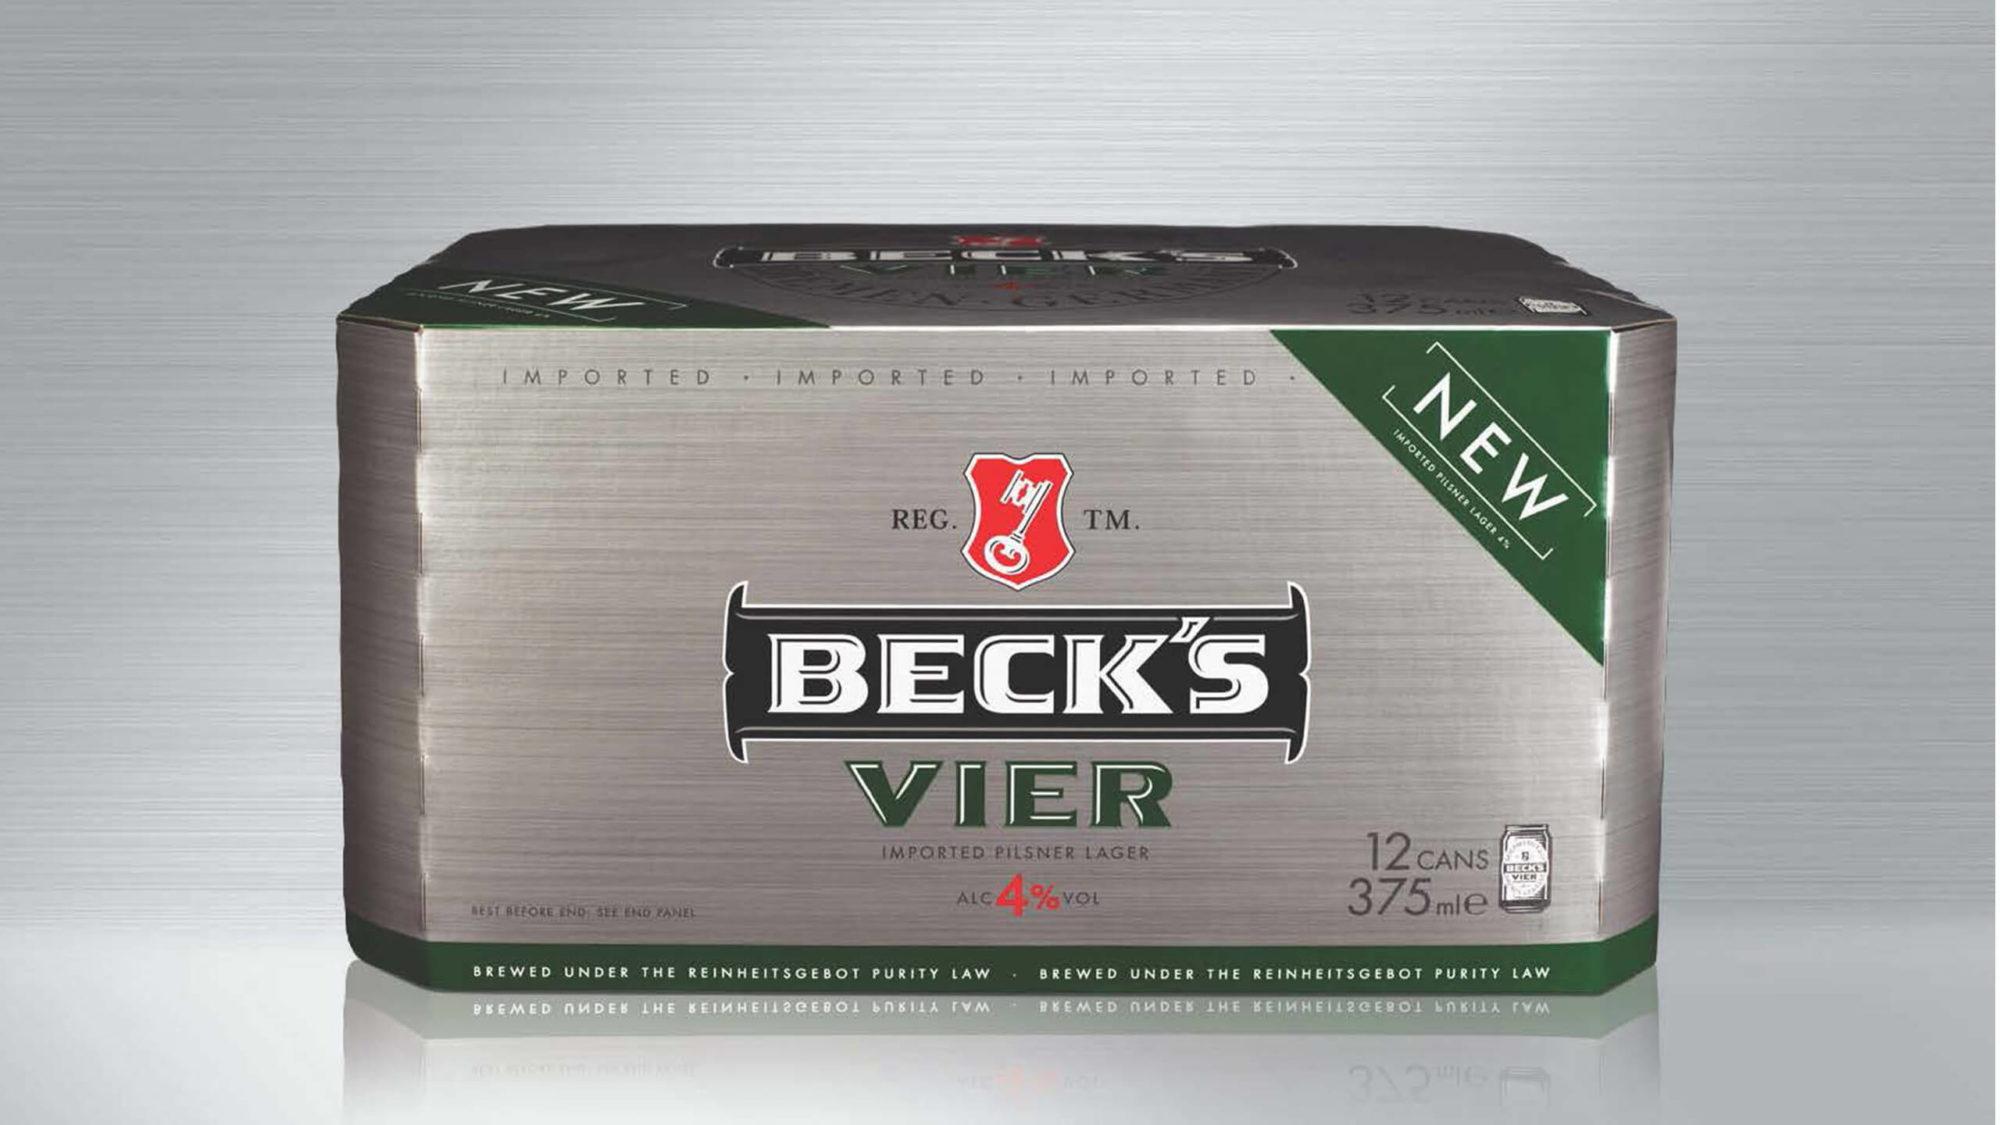 Beck's Vier